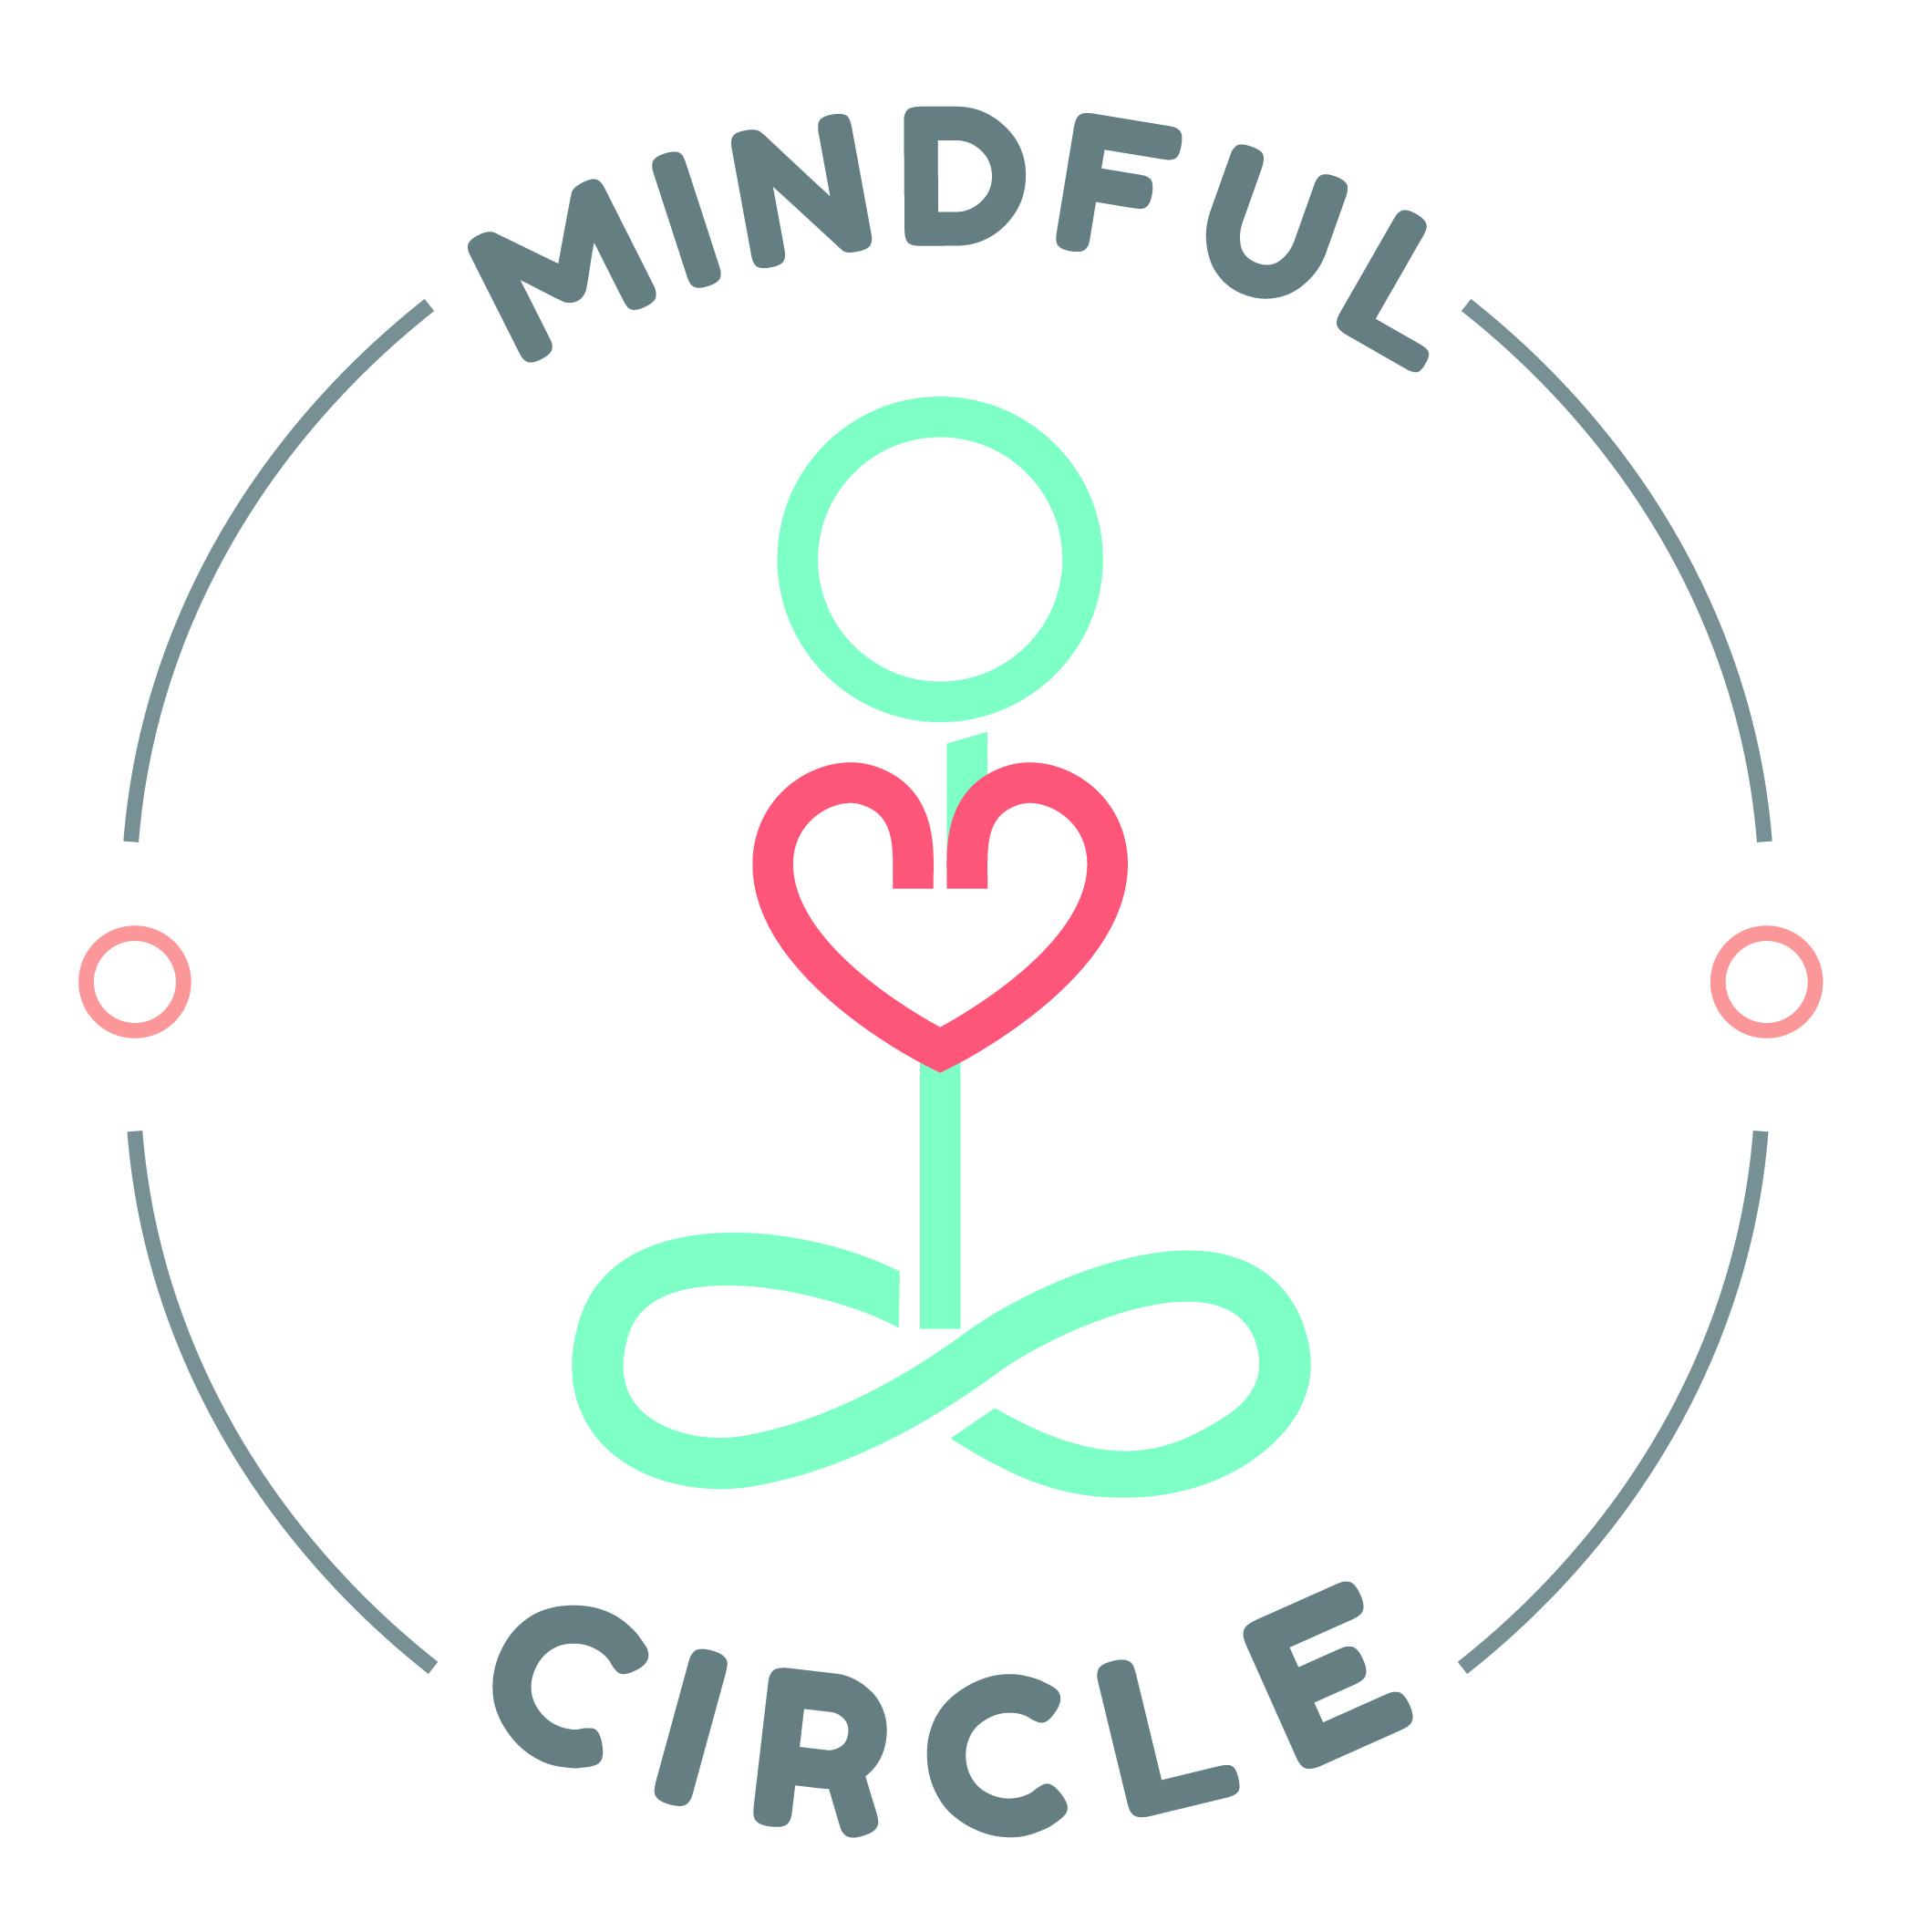 mindful-circle-01-1